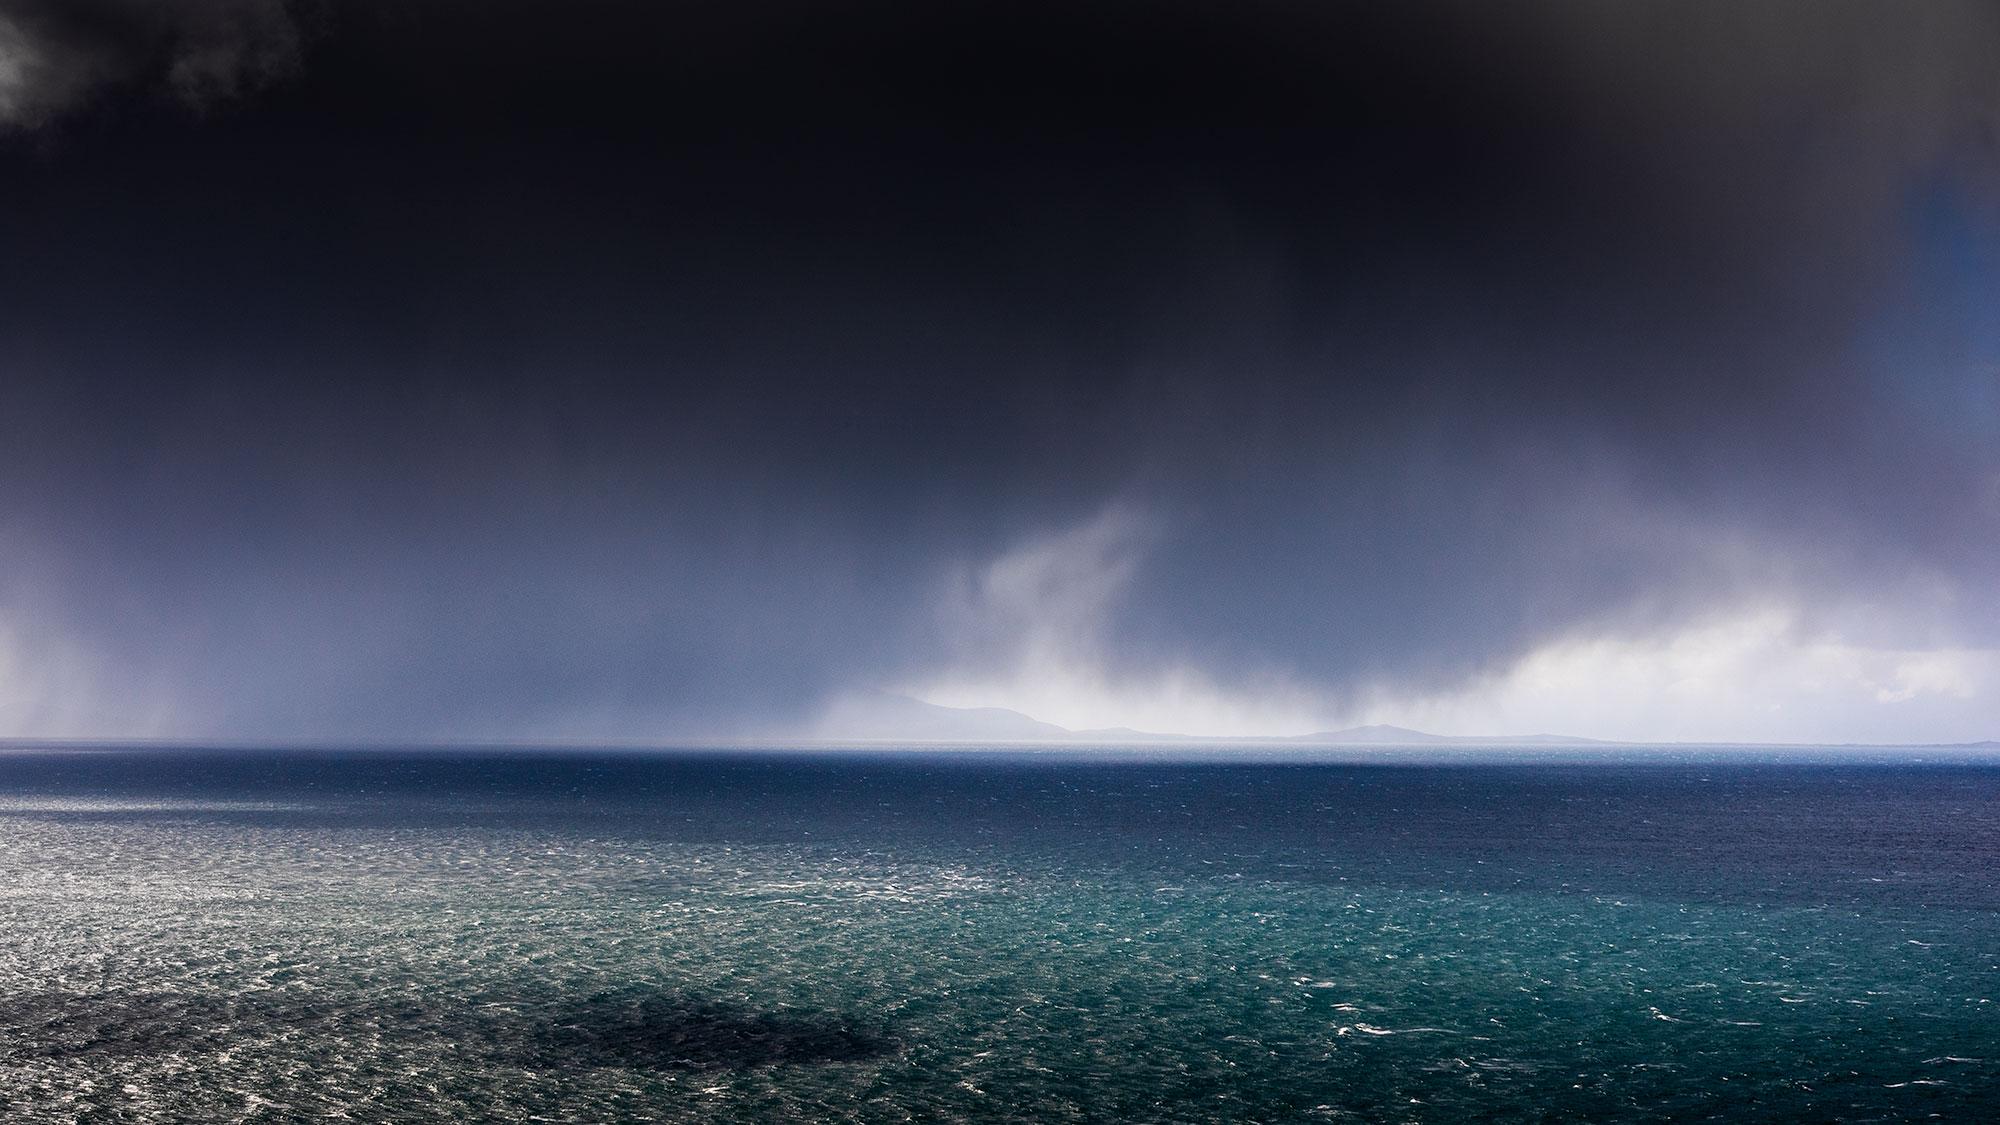 Dramatic seascape photography taken at Neist Point on Skye Island by the photographer Jennifer Esseiva.